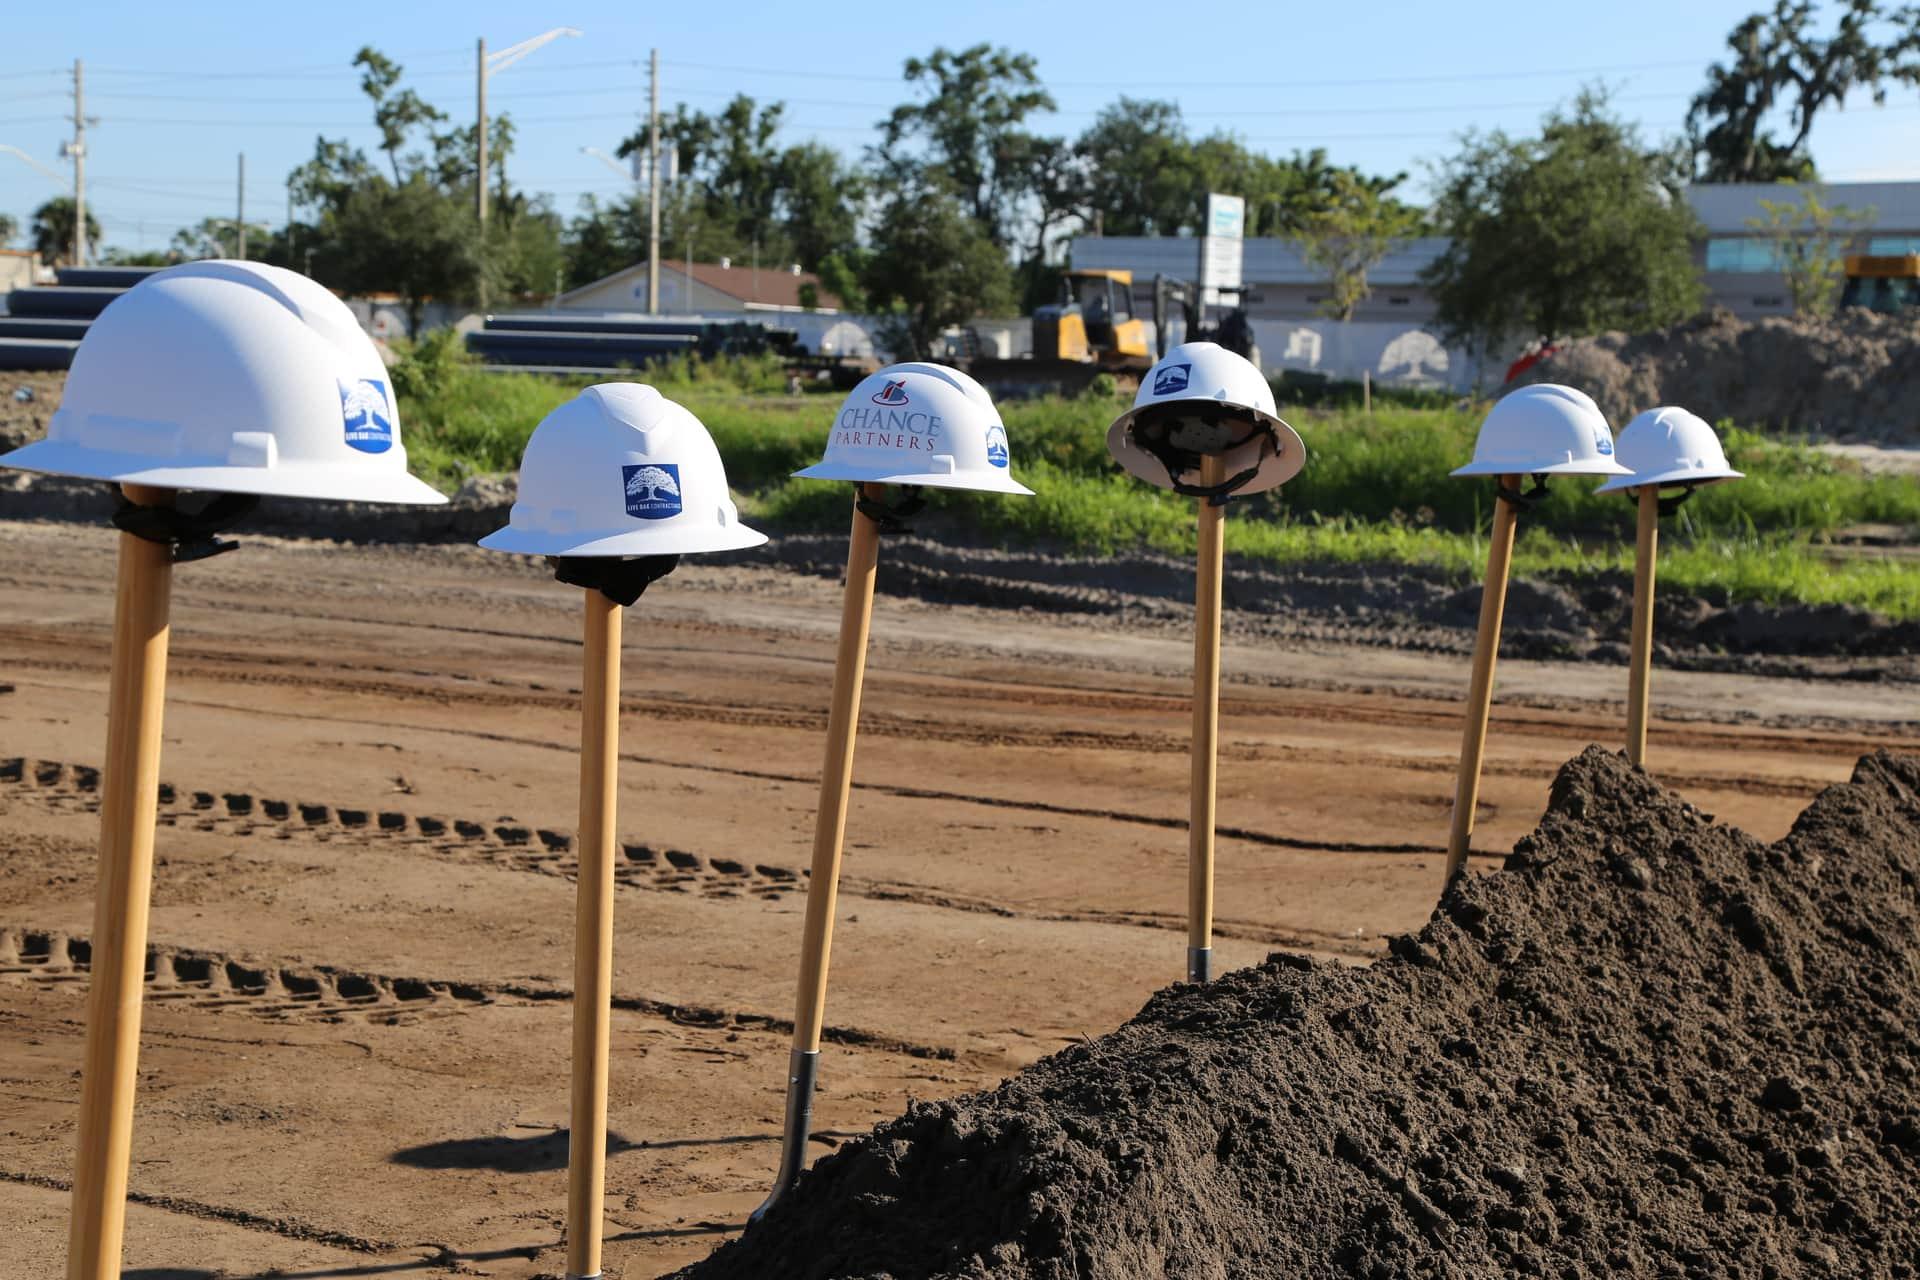 helmets on shovels at construction site